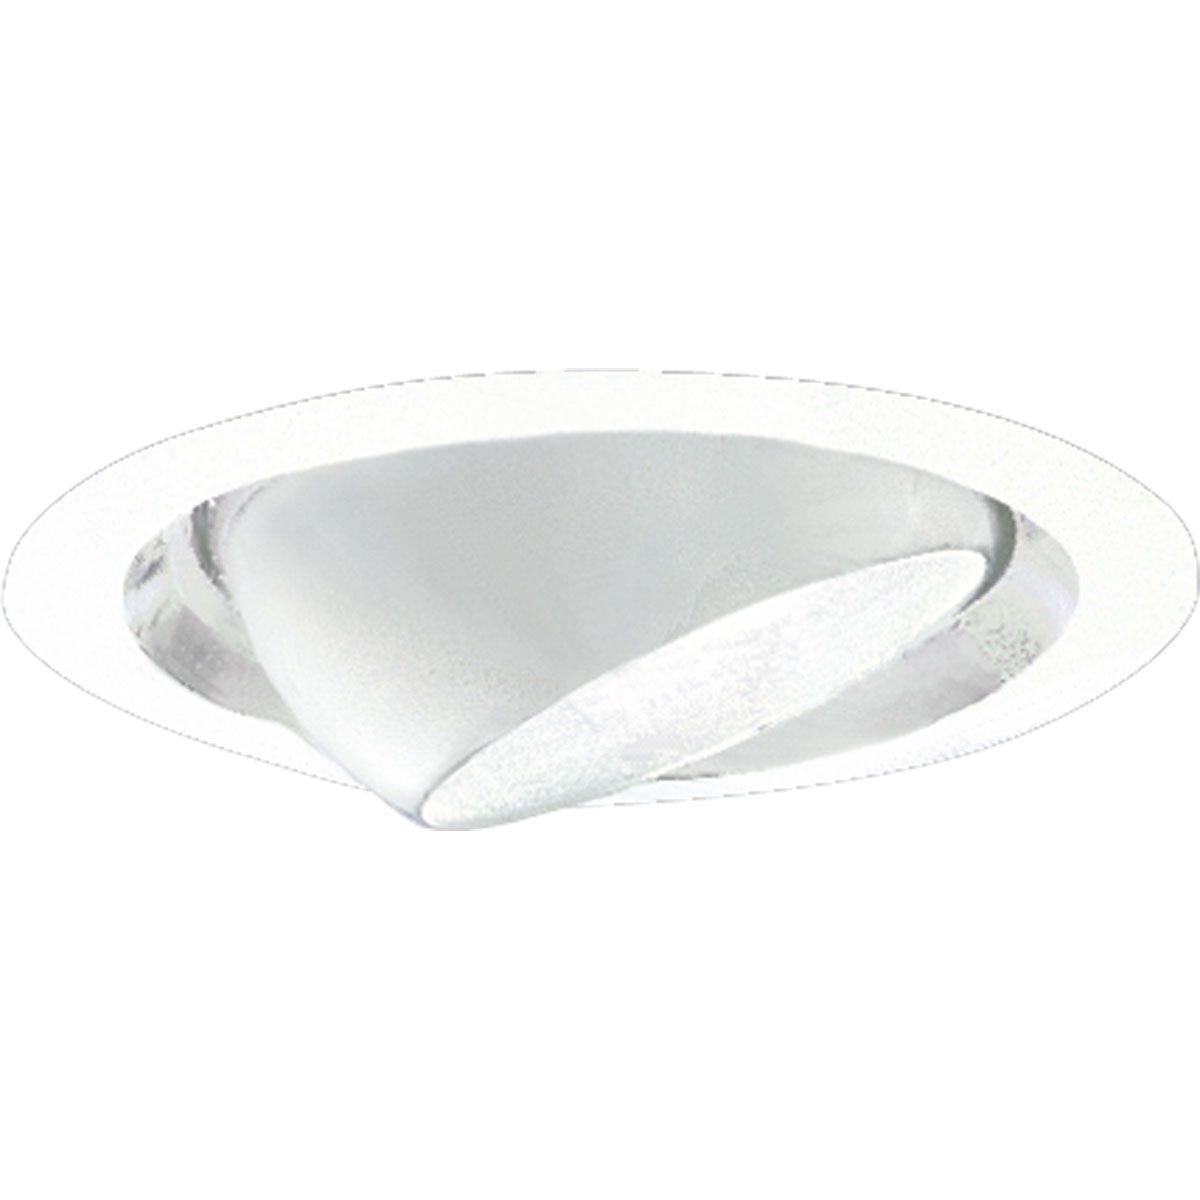 PROP6676-29 EYEBALL; SATIN WHITE; 6 INCH NOMINAL APERTURE SIZE; ROUND APERTURE SHAPE; PAR30/R30 75 W INCANDESCENT LAMP; PAR20/R20 50 W FLUORESCENT LAMP; INSULATED CEILING; SIZE 7 3/4 INCH DIA; PROGRESS LIGHTING[R] BRAND, PROGRESS